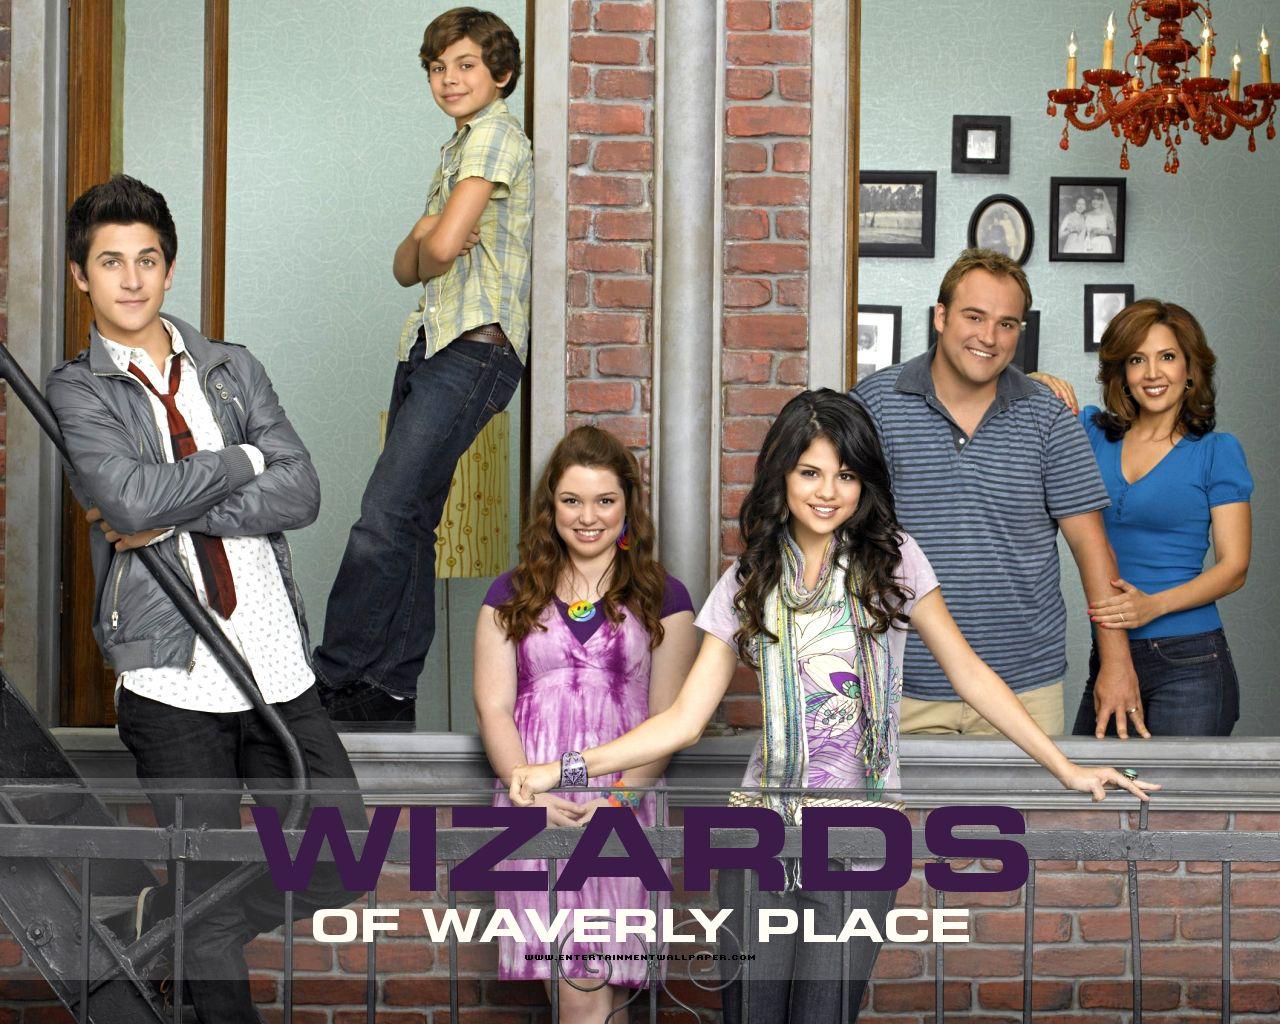 http://1.bp.blogspot.com/-6T31aA_xz6I/UBWqznmttuI/AAAAAAAAAE0/Ec4S8tyahv8/s1600/tv_wizards_of_waverly_place05.jpg